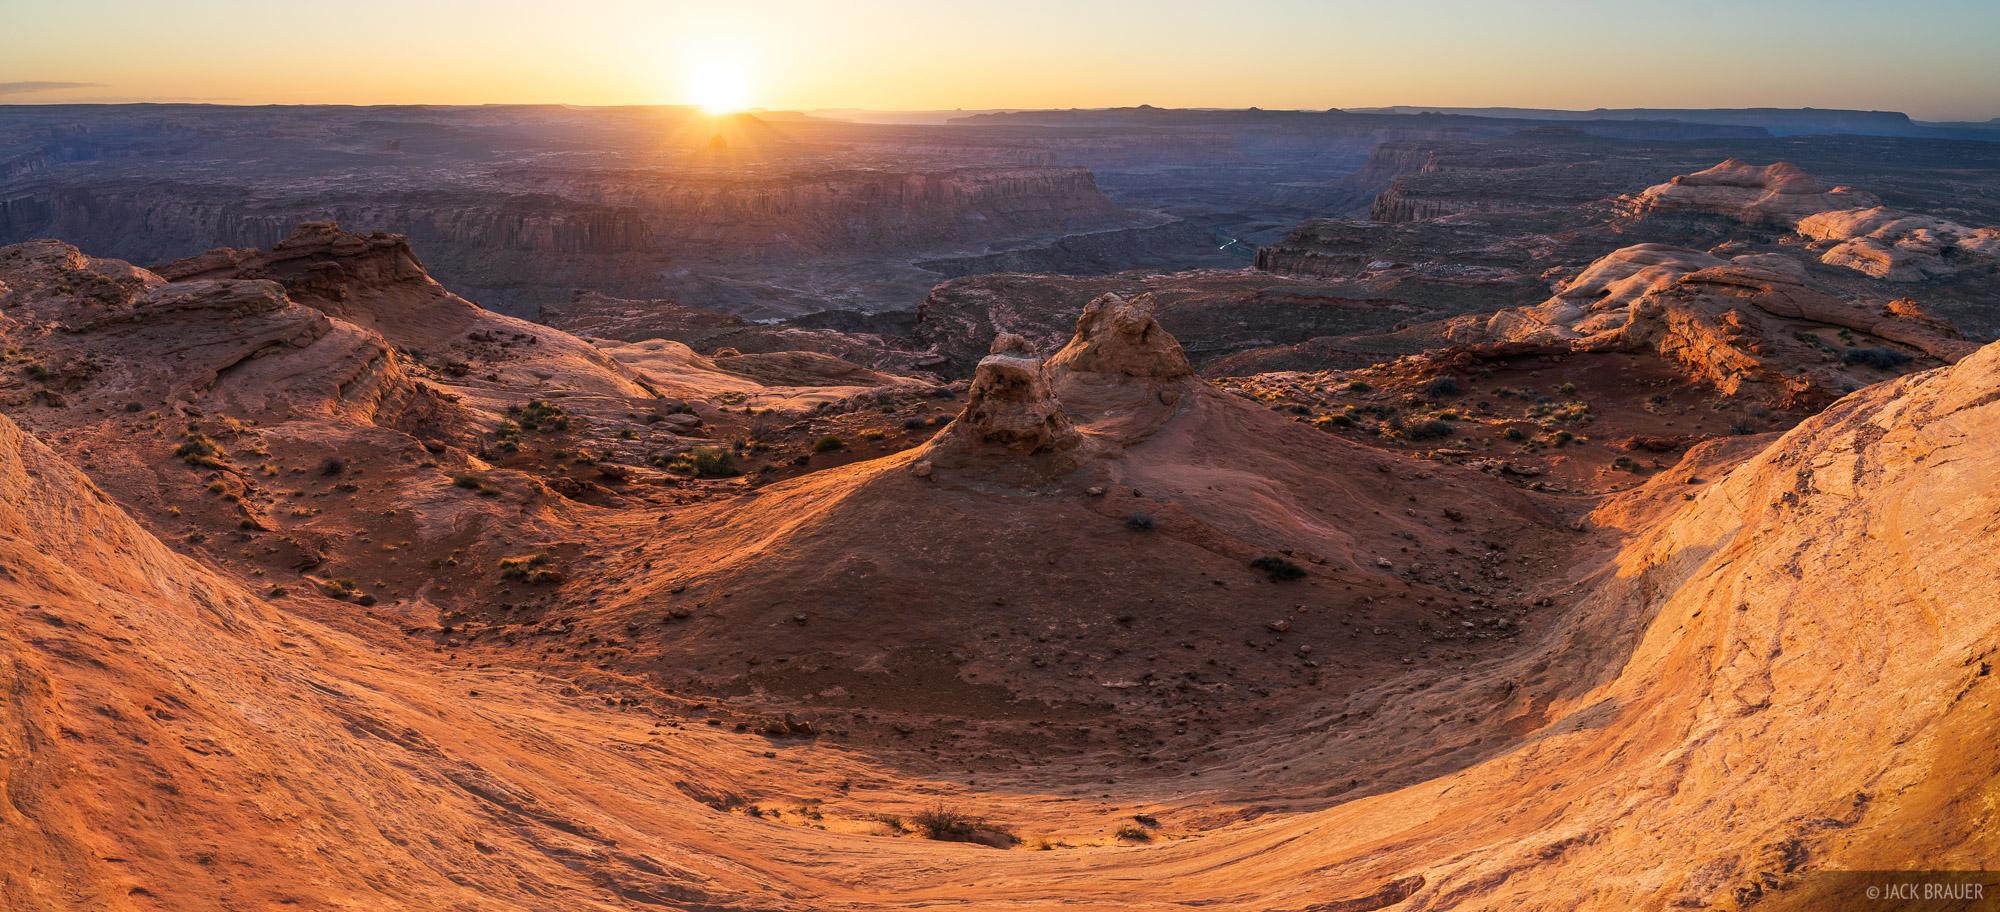 Sunrise light illuminates a slickrock bowl high above the Dirty Devil River.